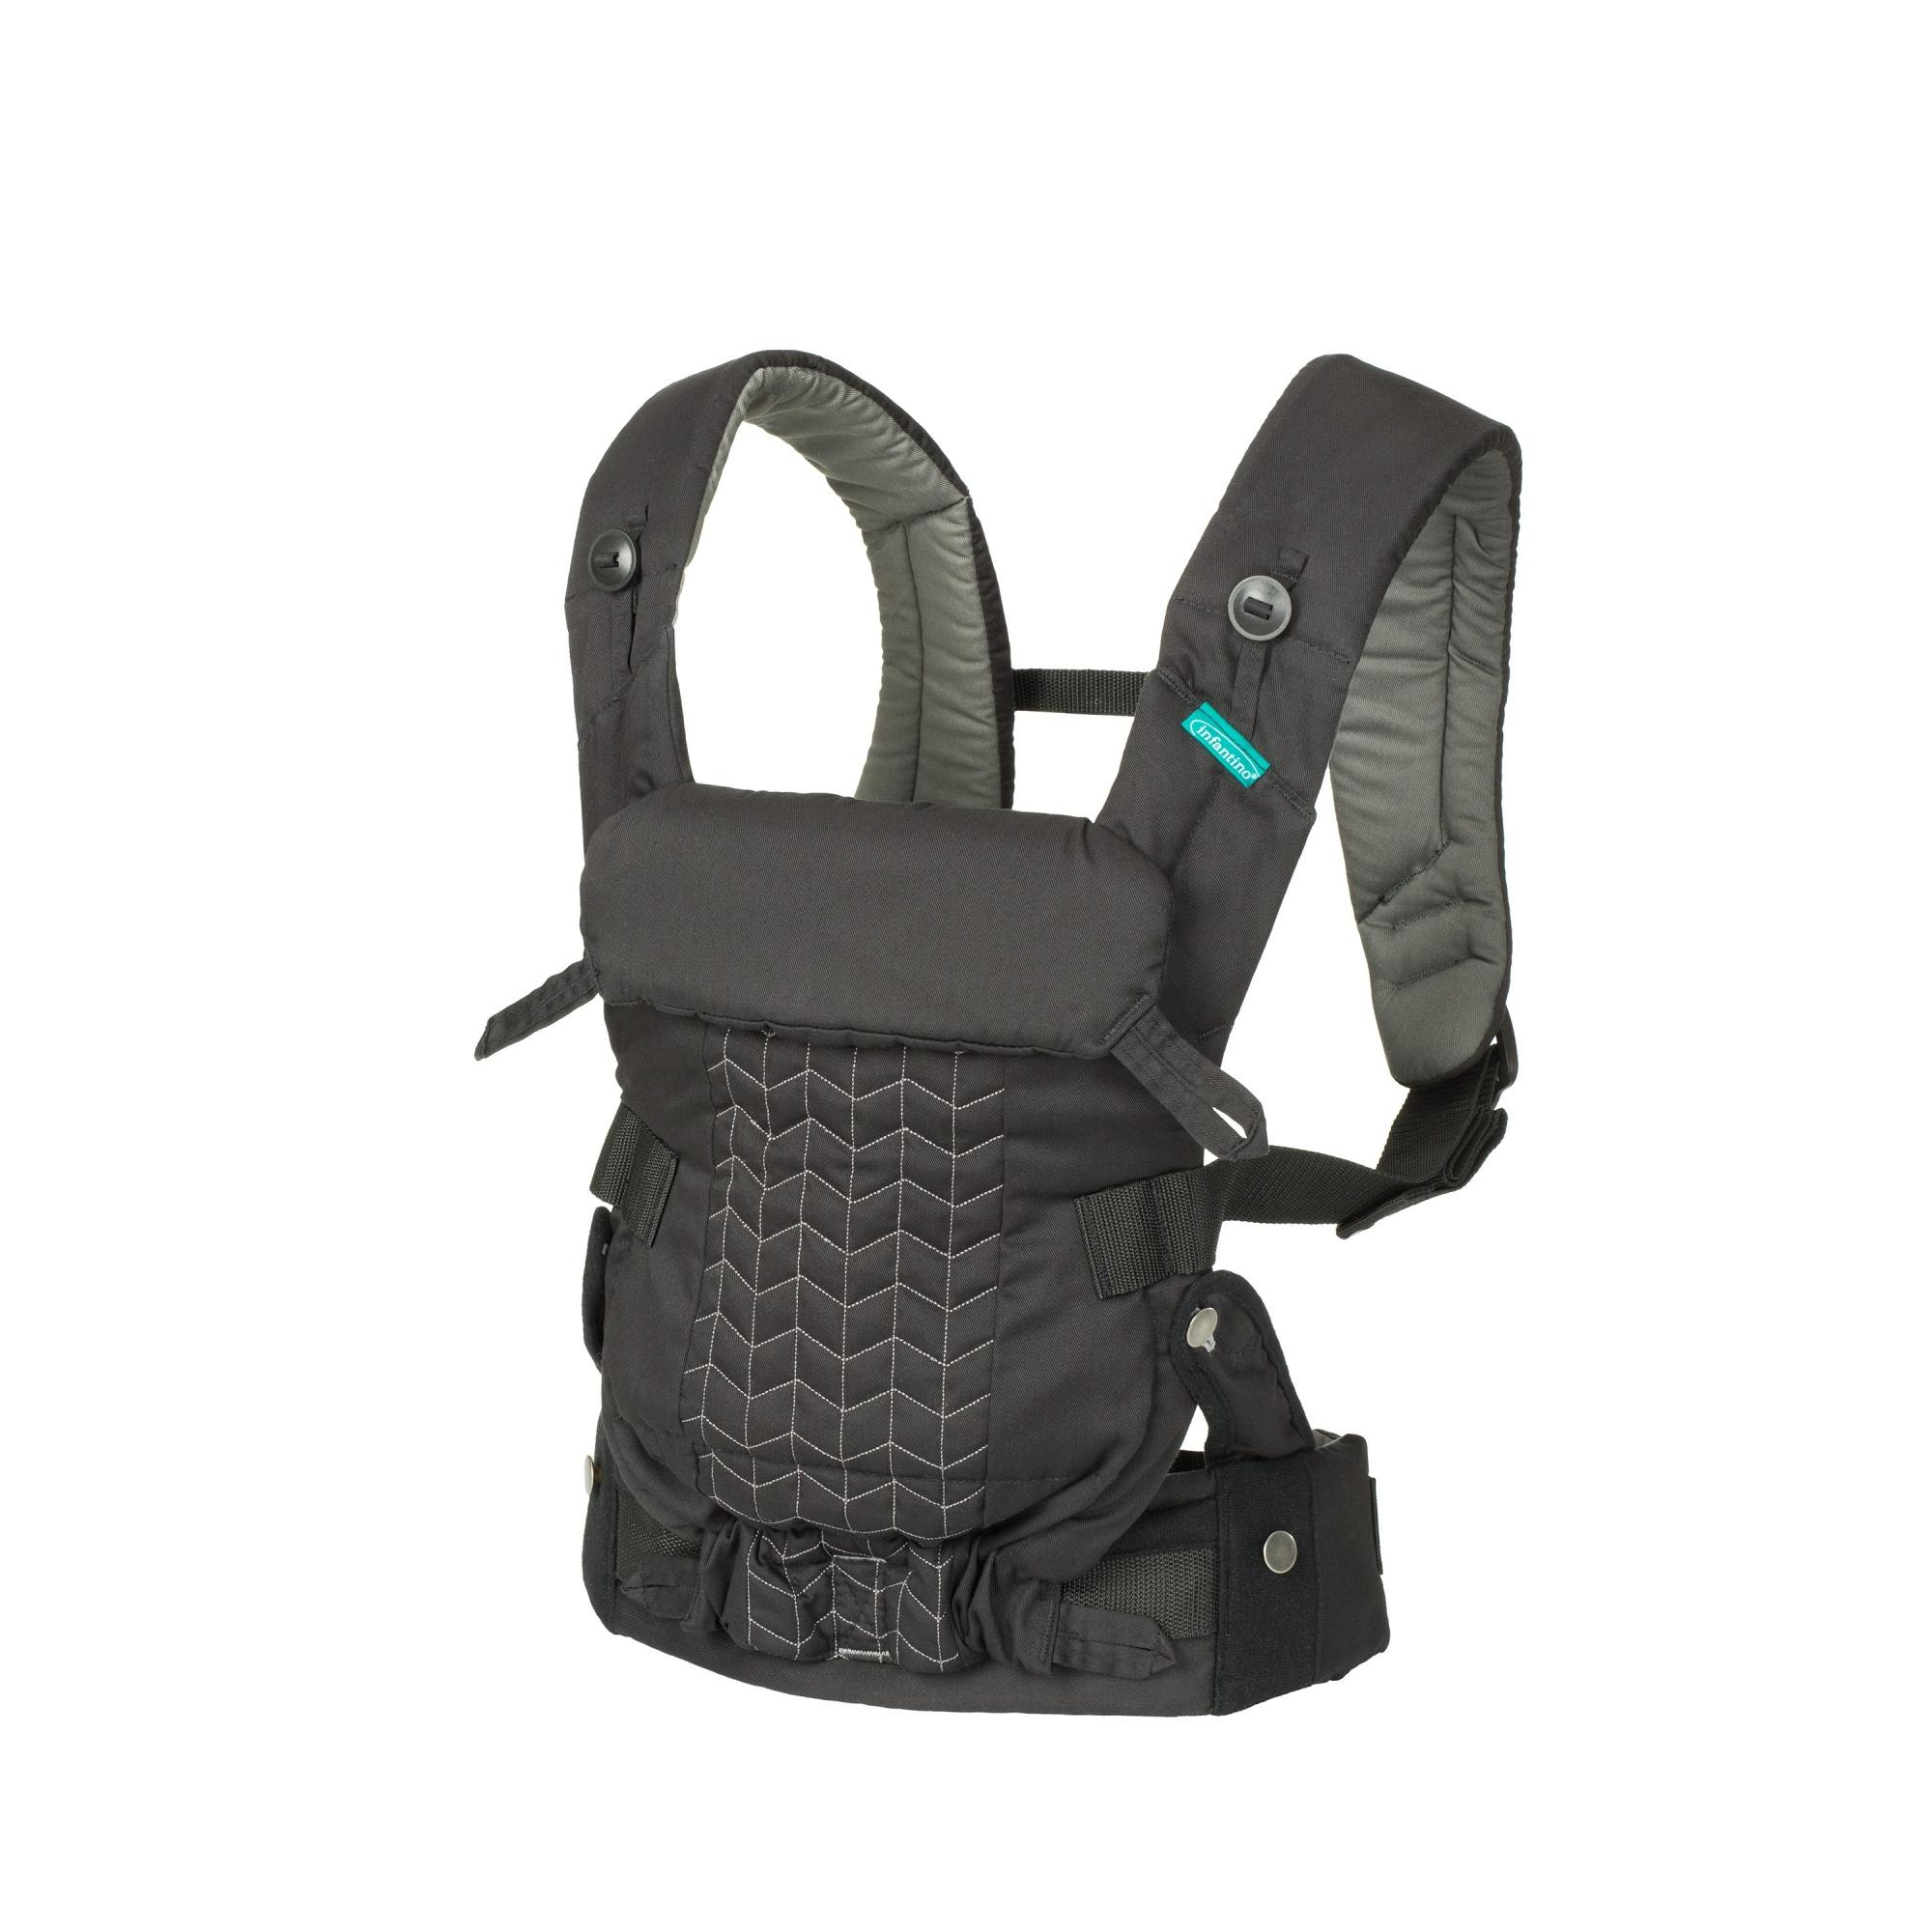 b0792e5920e Toddler Backpack Carrier Australia – Patmo Technologies Limited